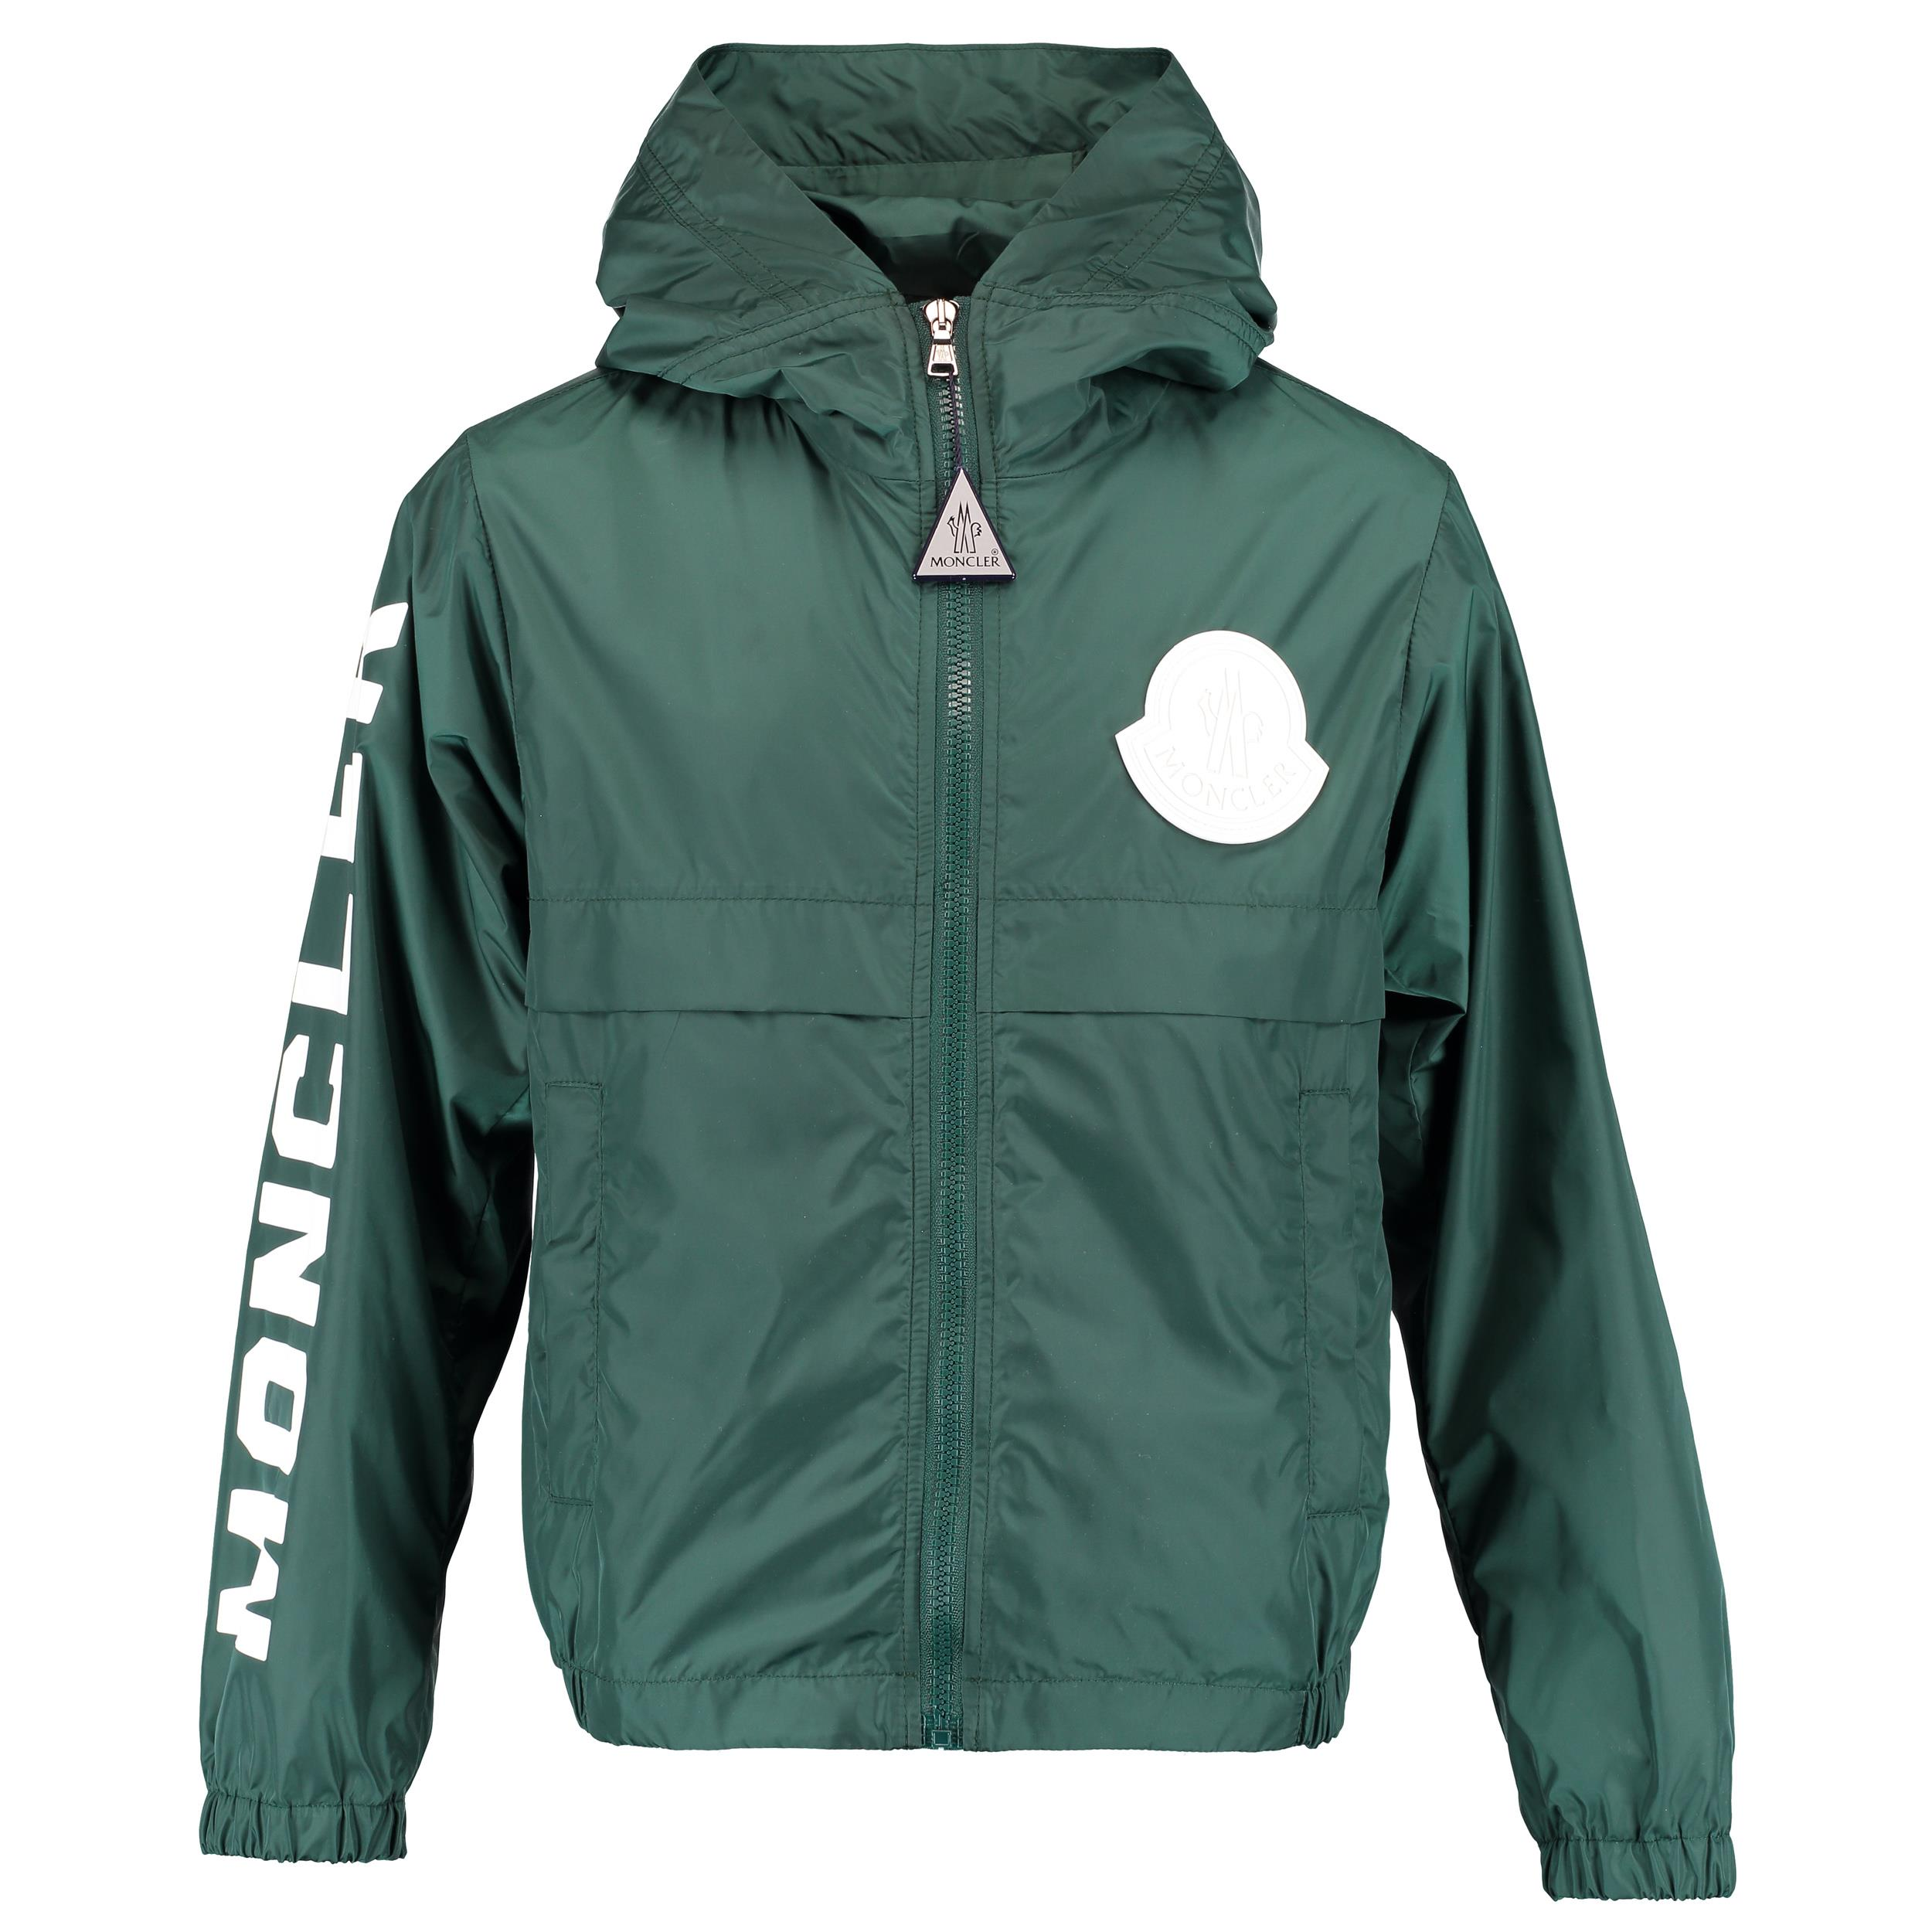 buy online 85624 10087 Moncler Jungen Jacke